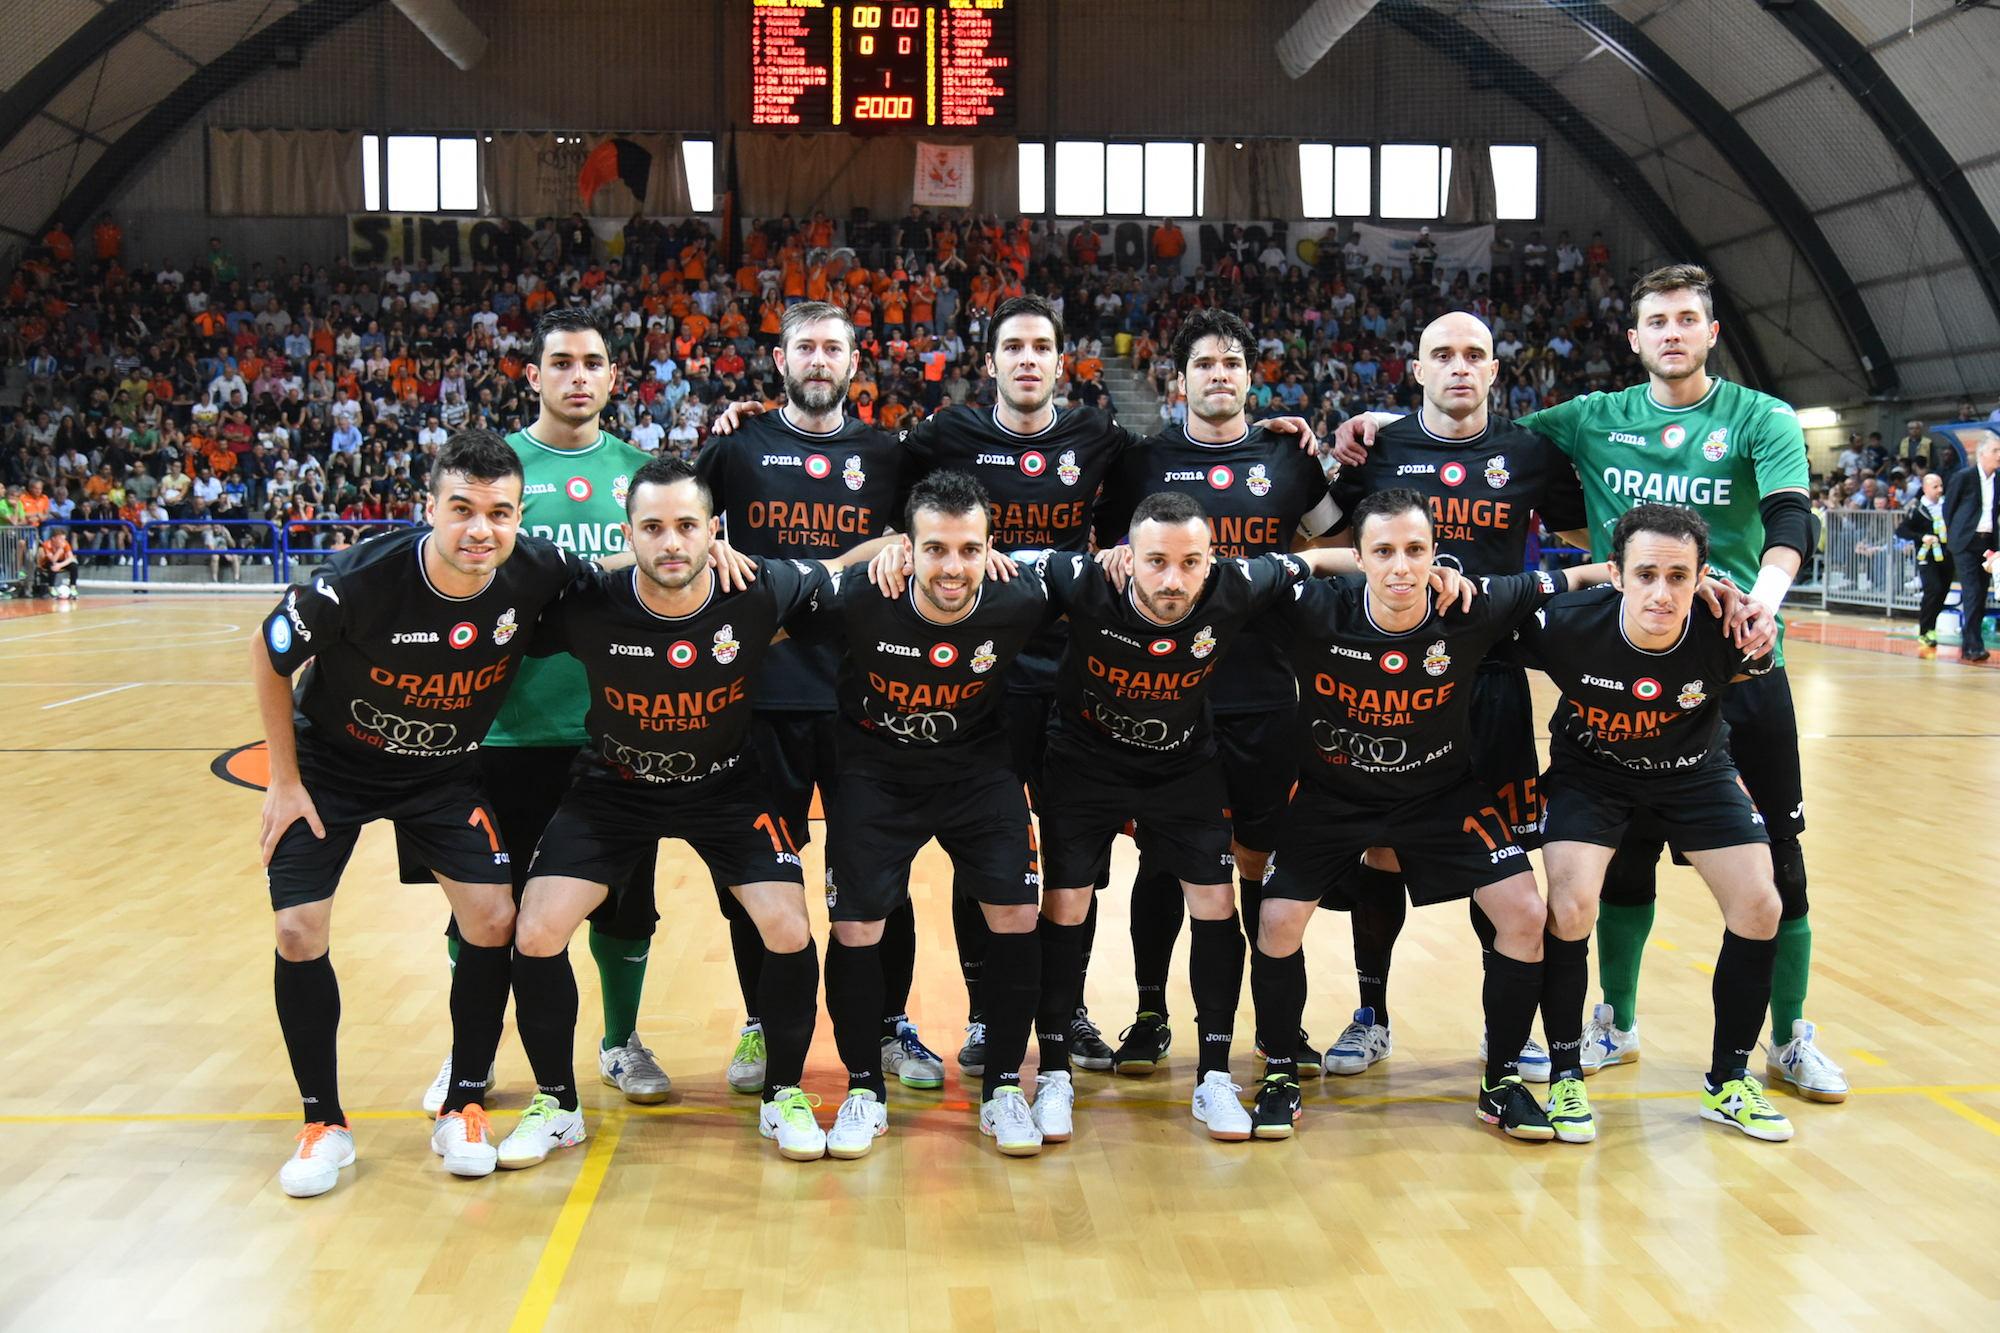 L'Orange Futsal sconfitta di misura dal Real Rieti